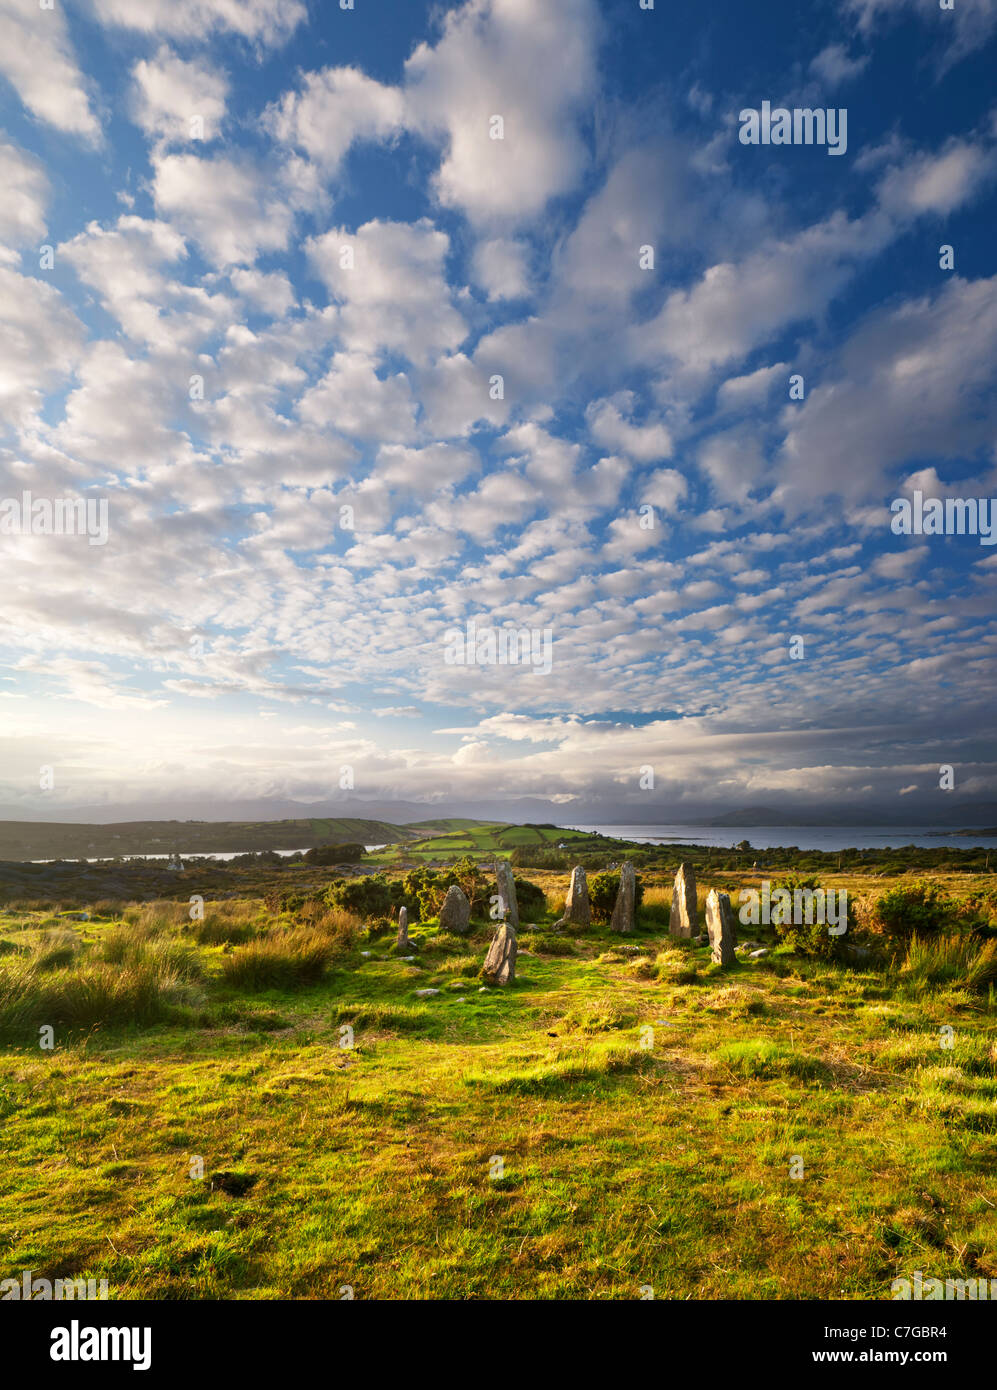 the-stone-circle-near-ardgroom-beara-peninsula-county-cork-ireland-C7GBR4.jpg